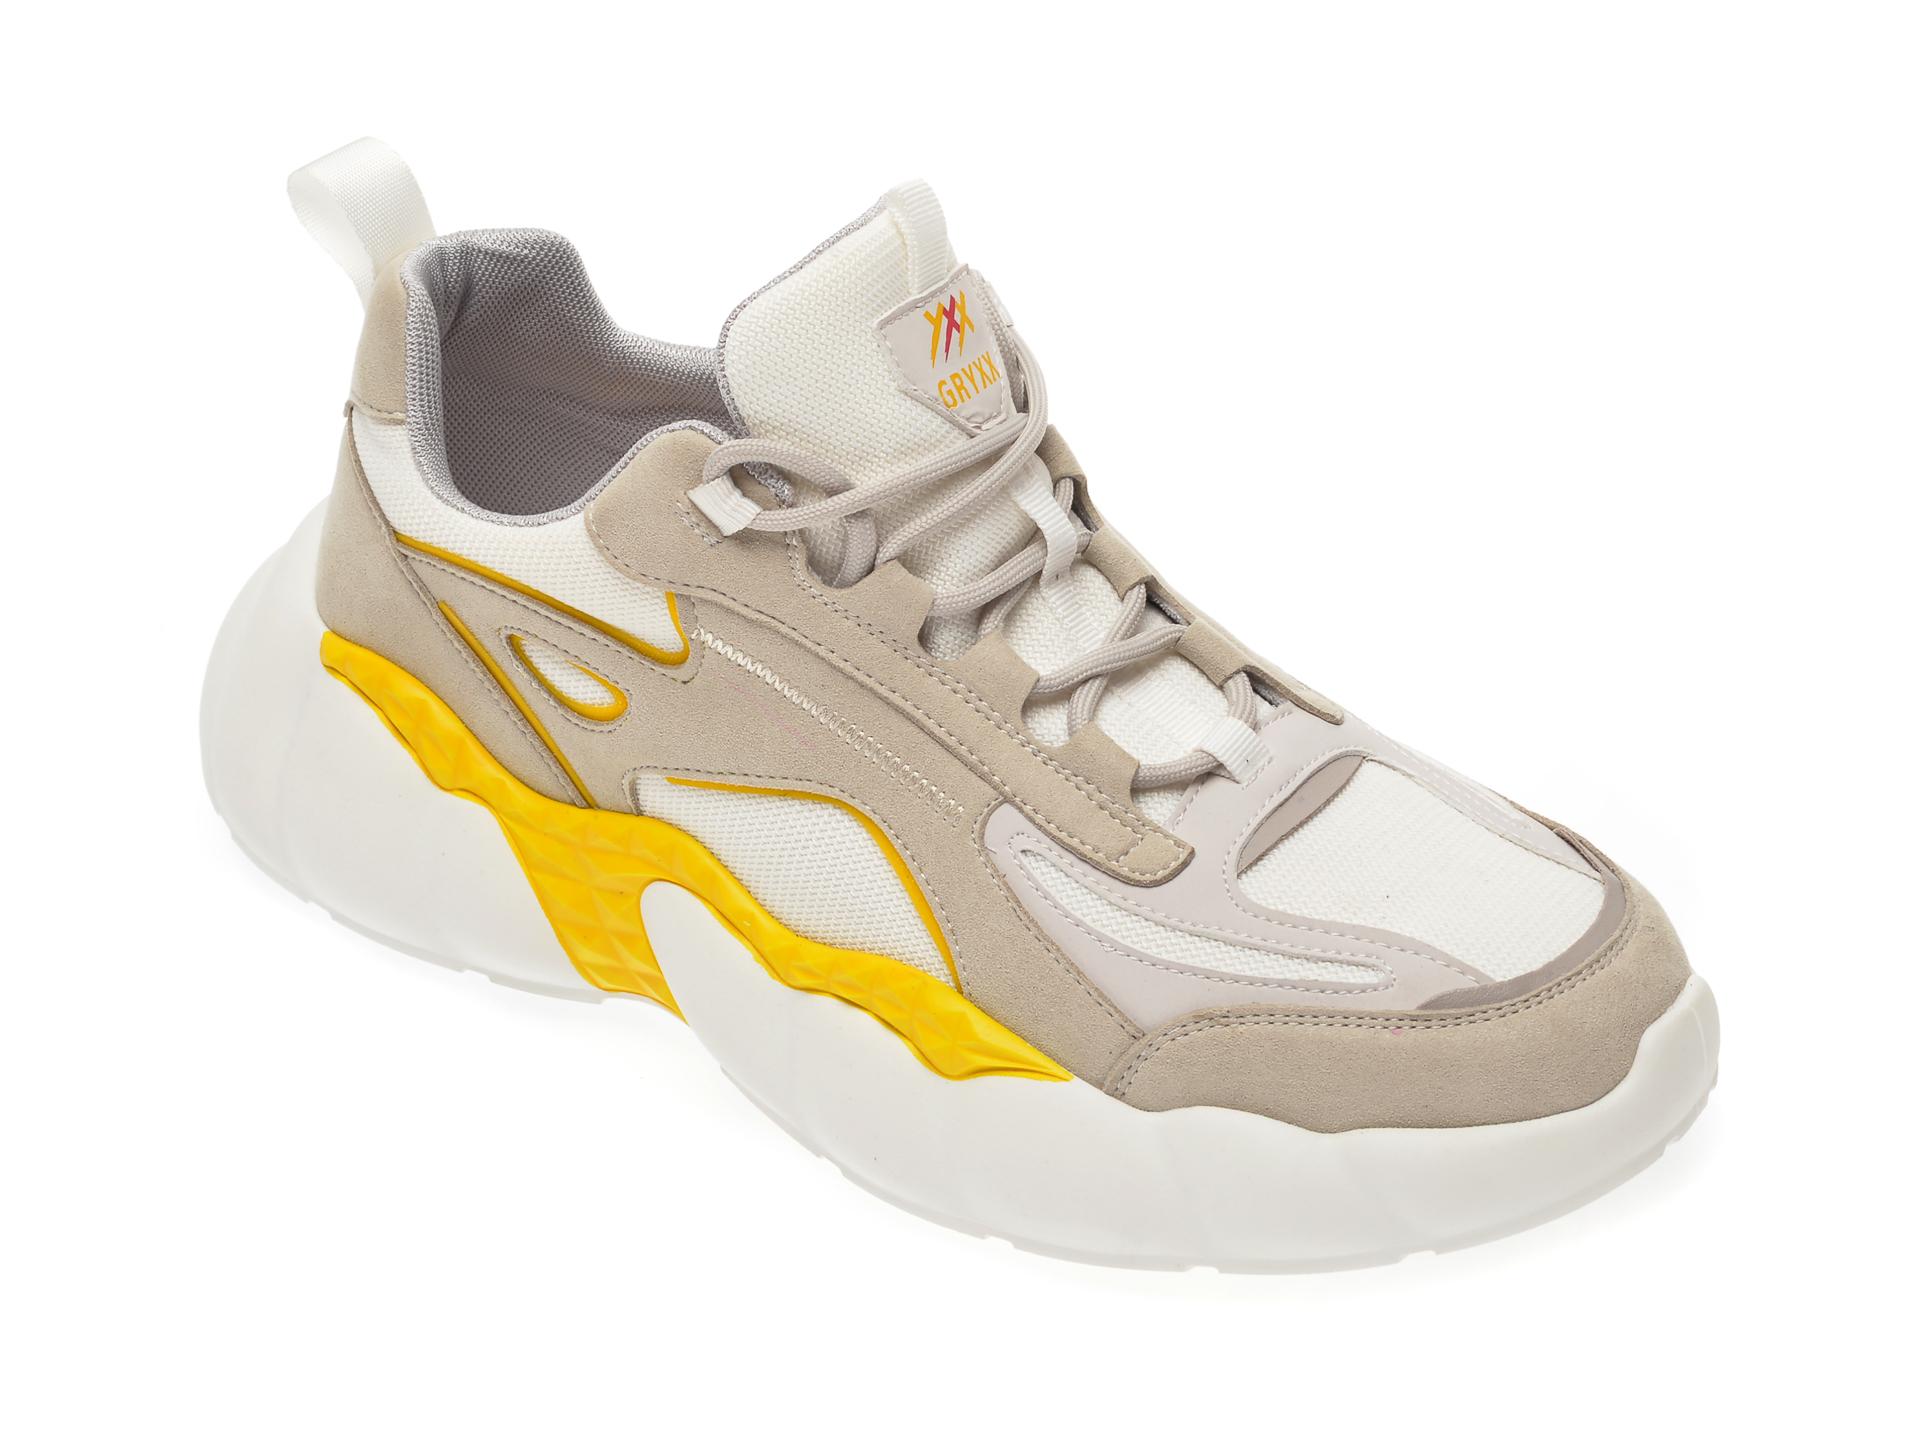 Pantofi sport GRYXX albi, 3893, din material textil si piele ecologica